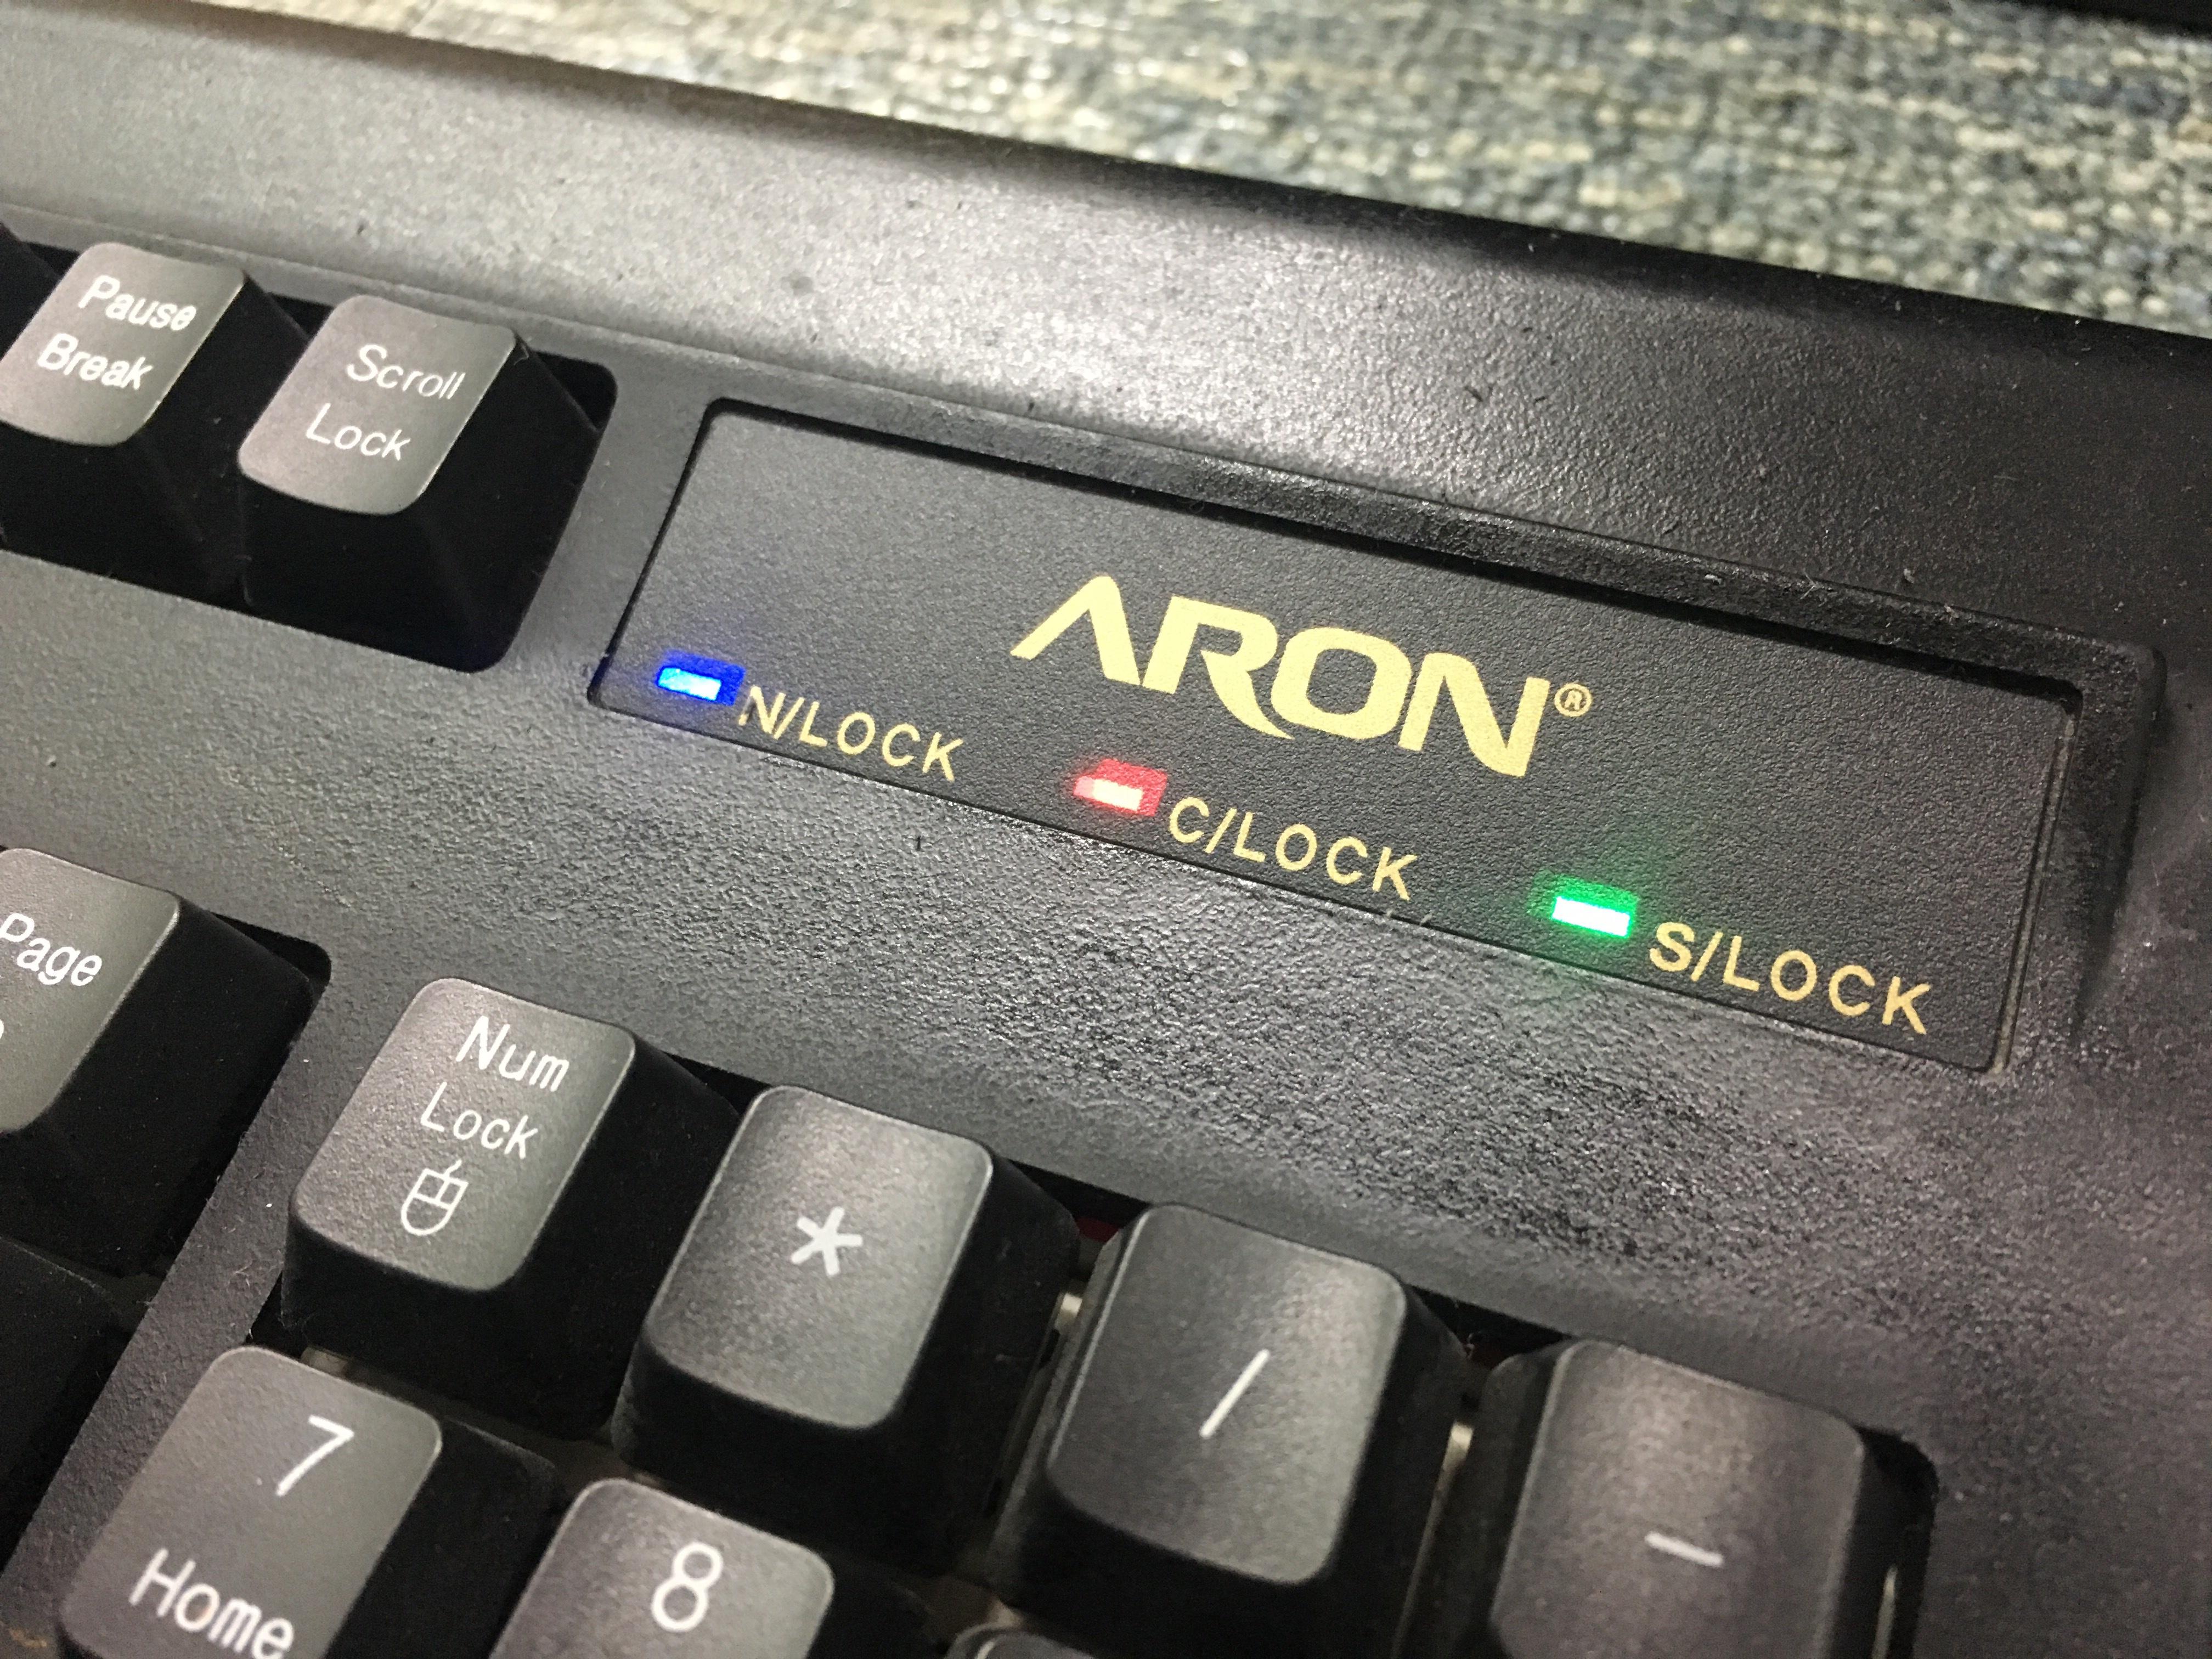 Aron 아론 기계식 키보드 LED